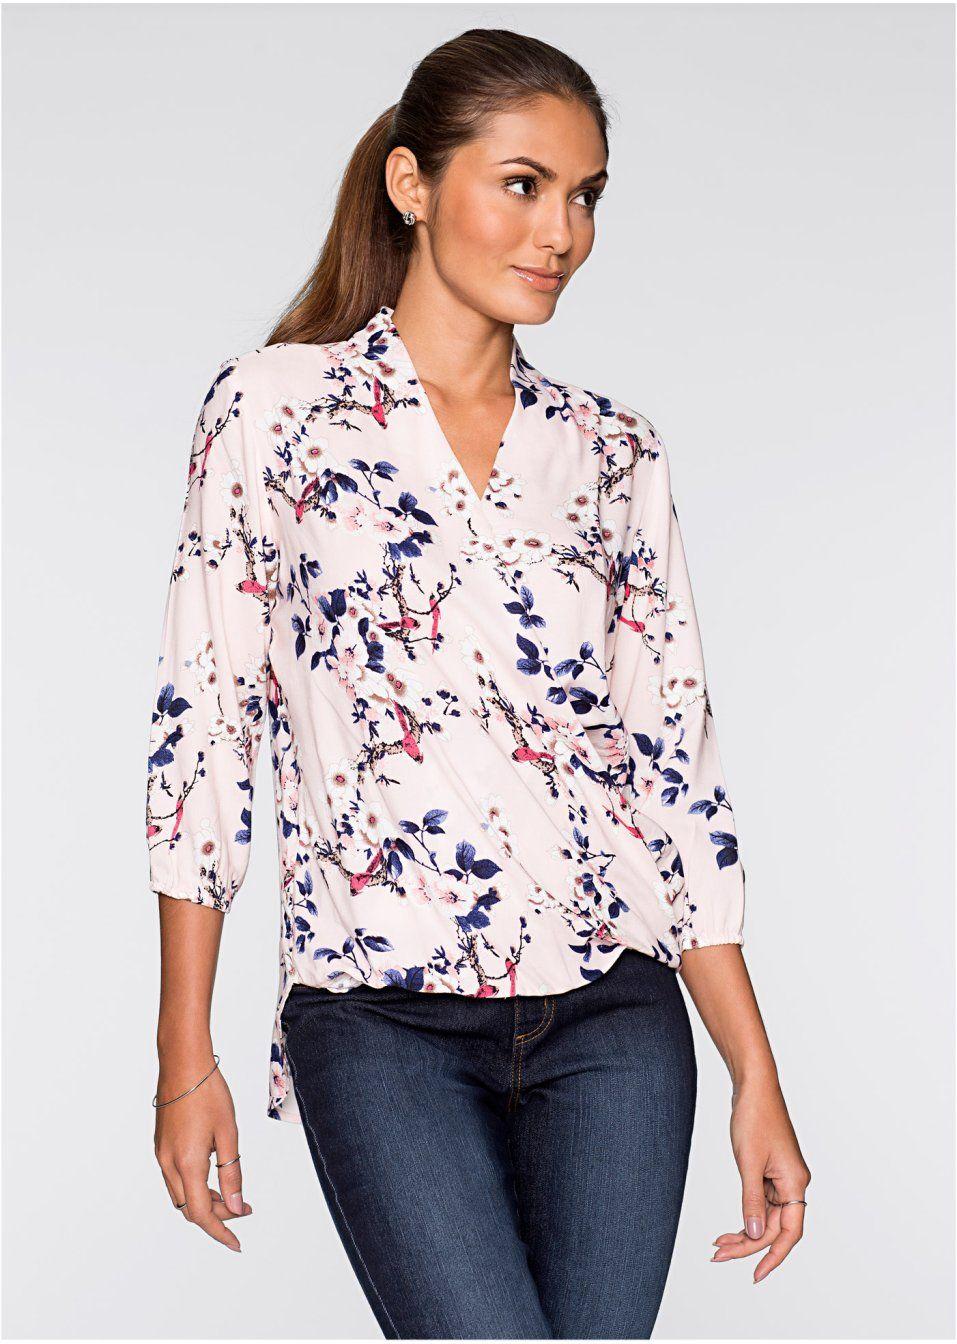 Bluzka W Kwiaty Floral Tops Fashion Women